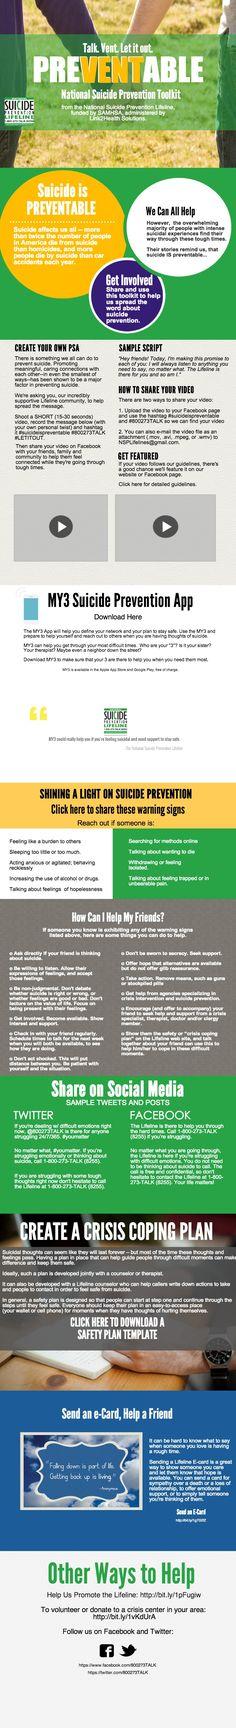 National Suicide Prevention Lifeline Toolkit | Piktochart Infographic Editor